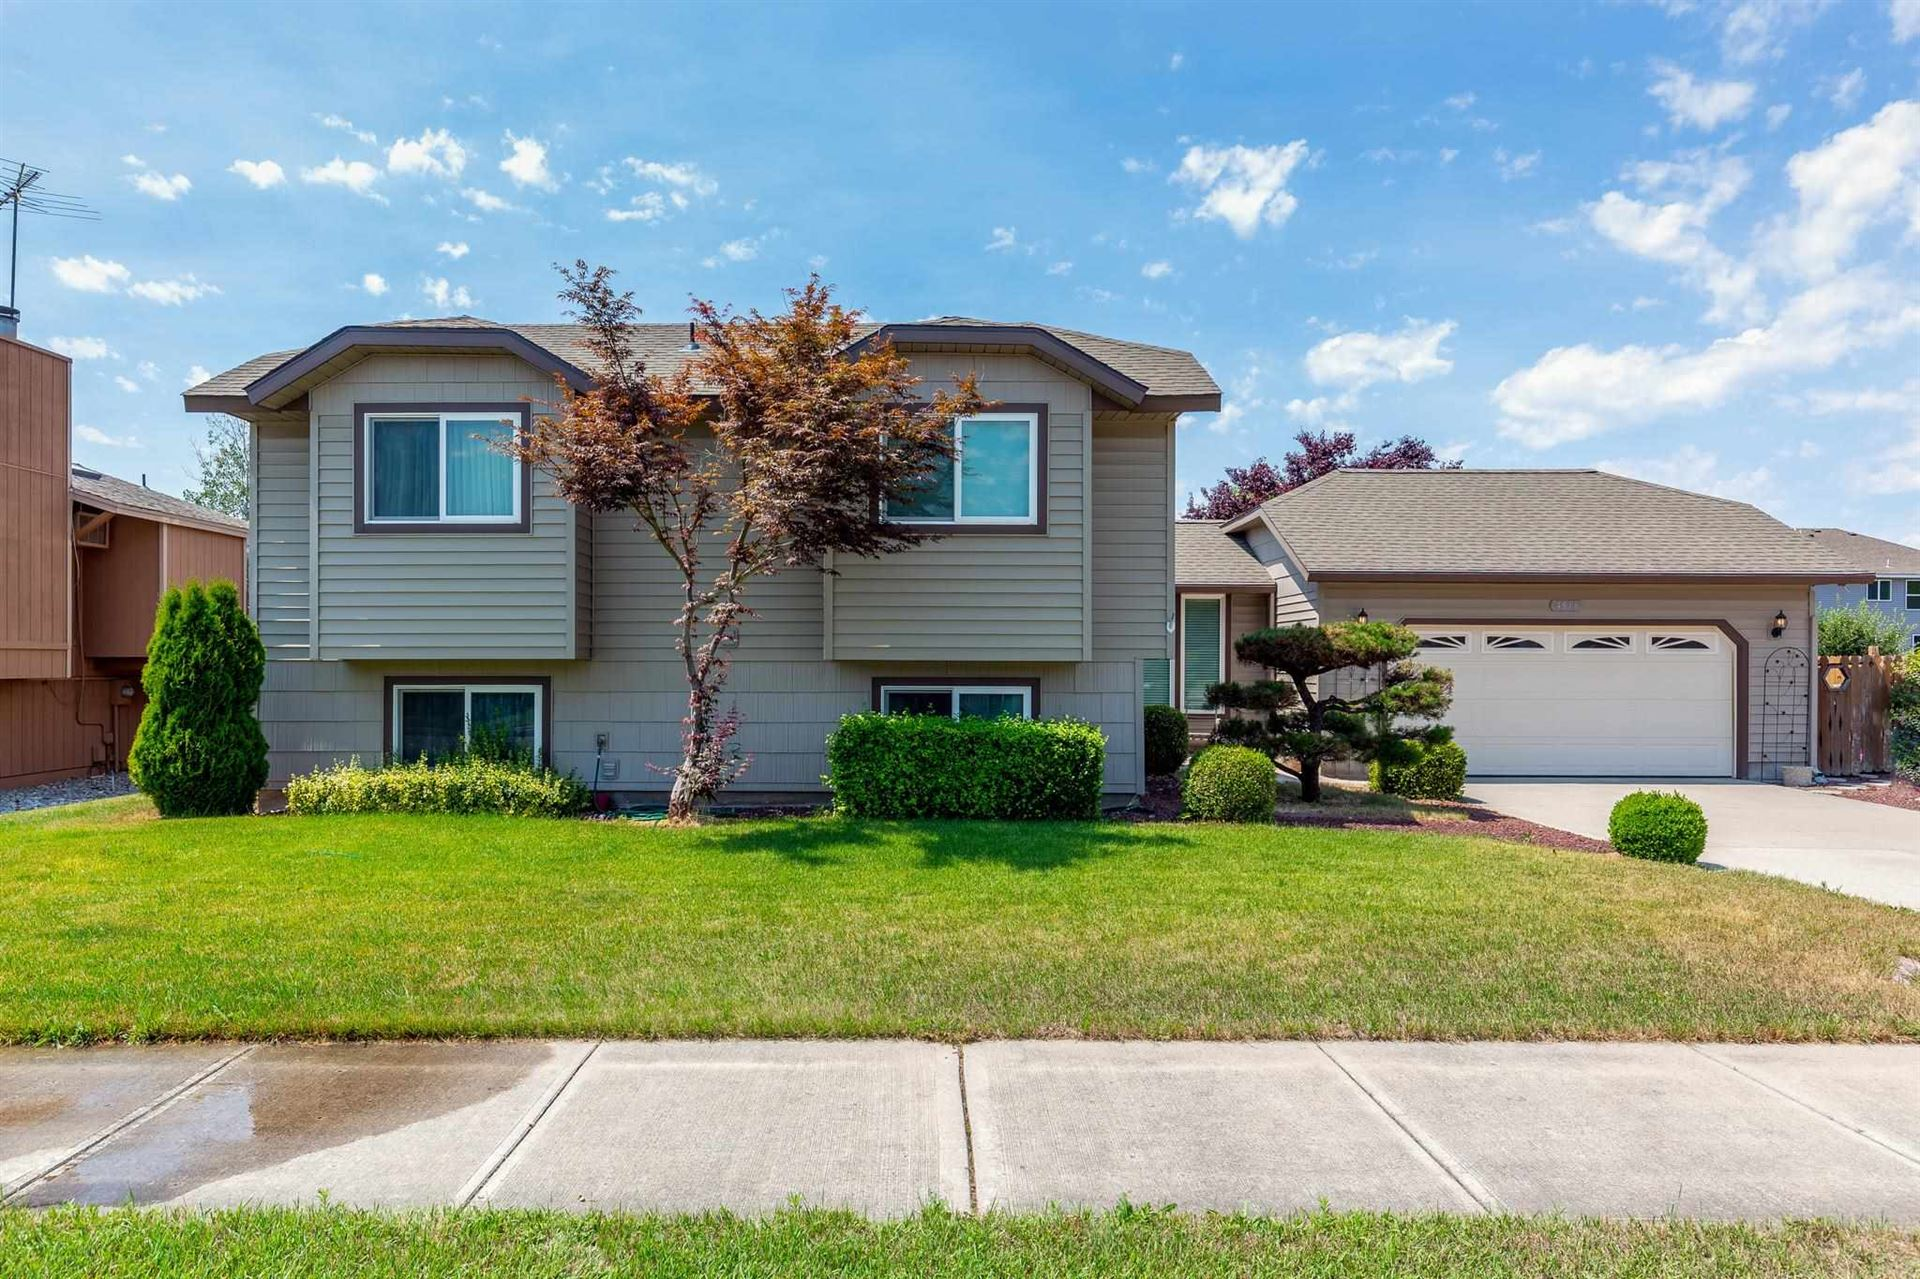 4913 N Calvin Rd, Spokane Valley, WA 99216 - #: 202118528